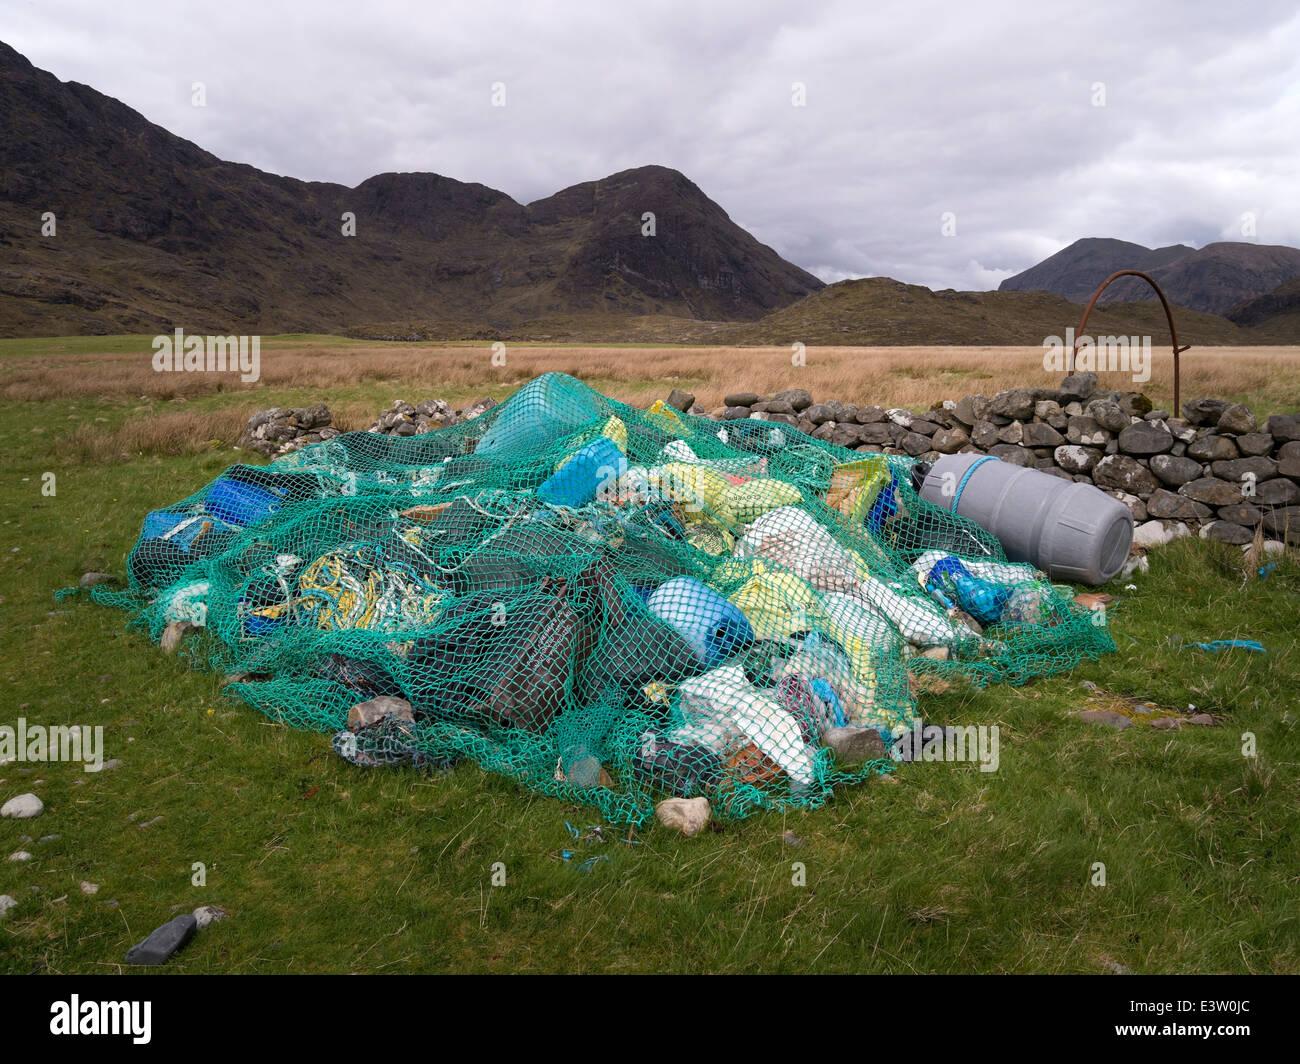 Collection of beach rubbish (flotsam and jetsam) under old fishing net at Camasunary Bay, Isle of Skye, Scotland, - Stock Image